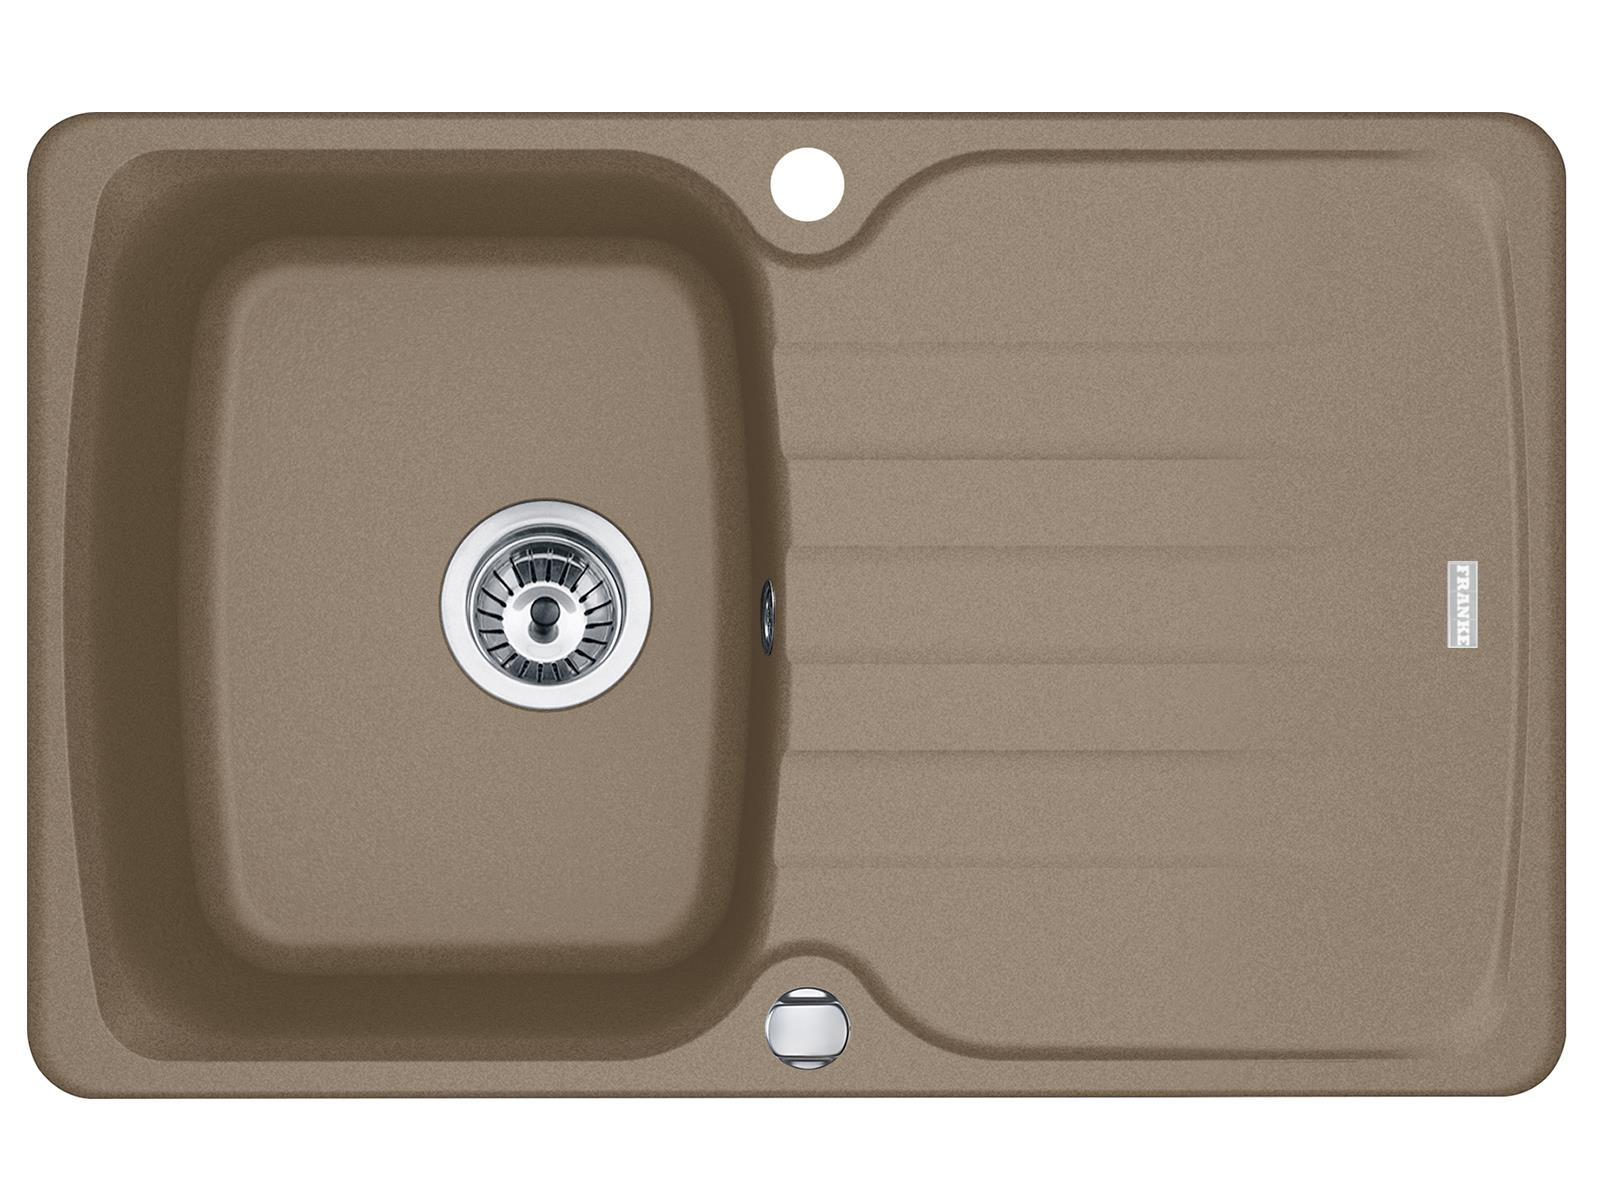 Franke Antea AZG 611-78 Cashmere - 114.0512.153 Granitspüle Exzenterbetätigung